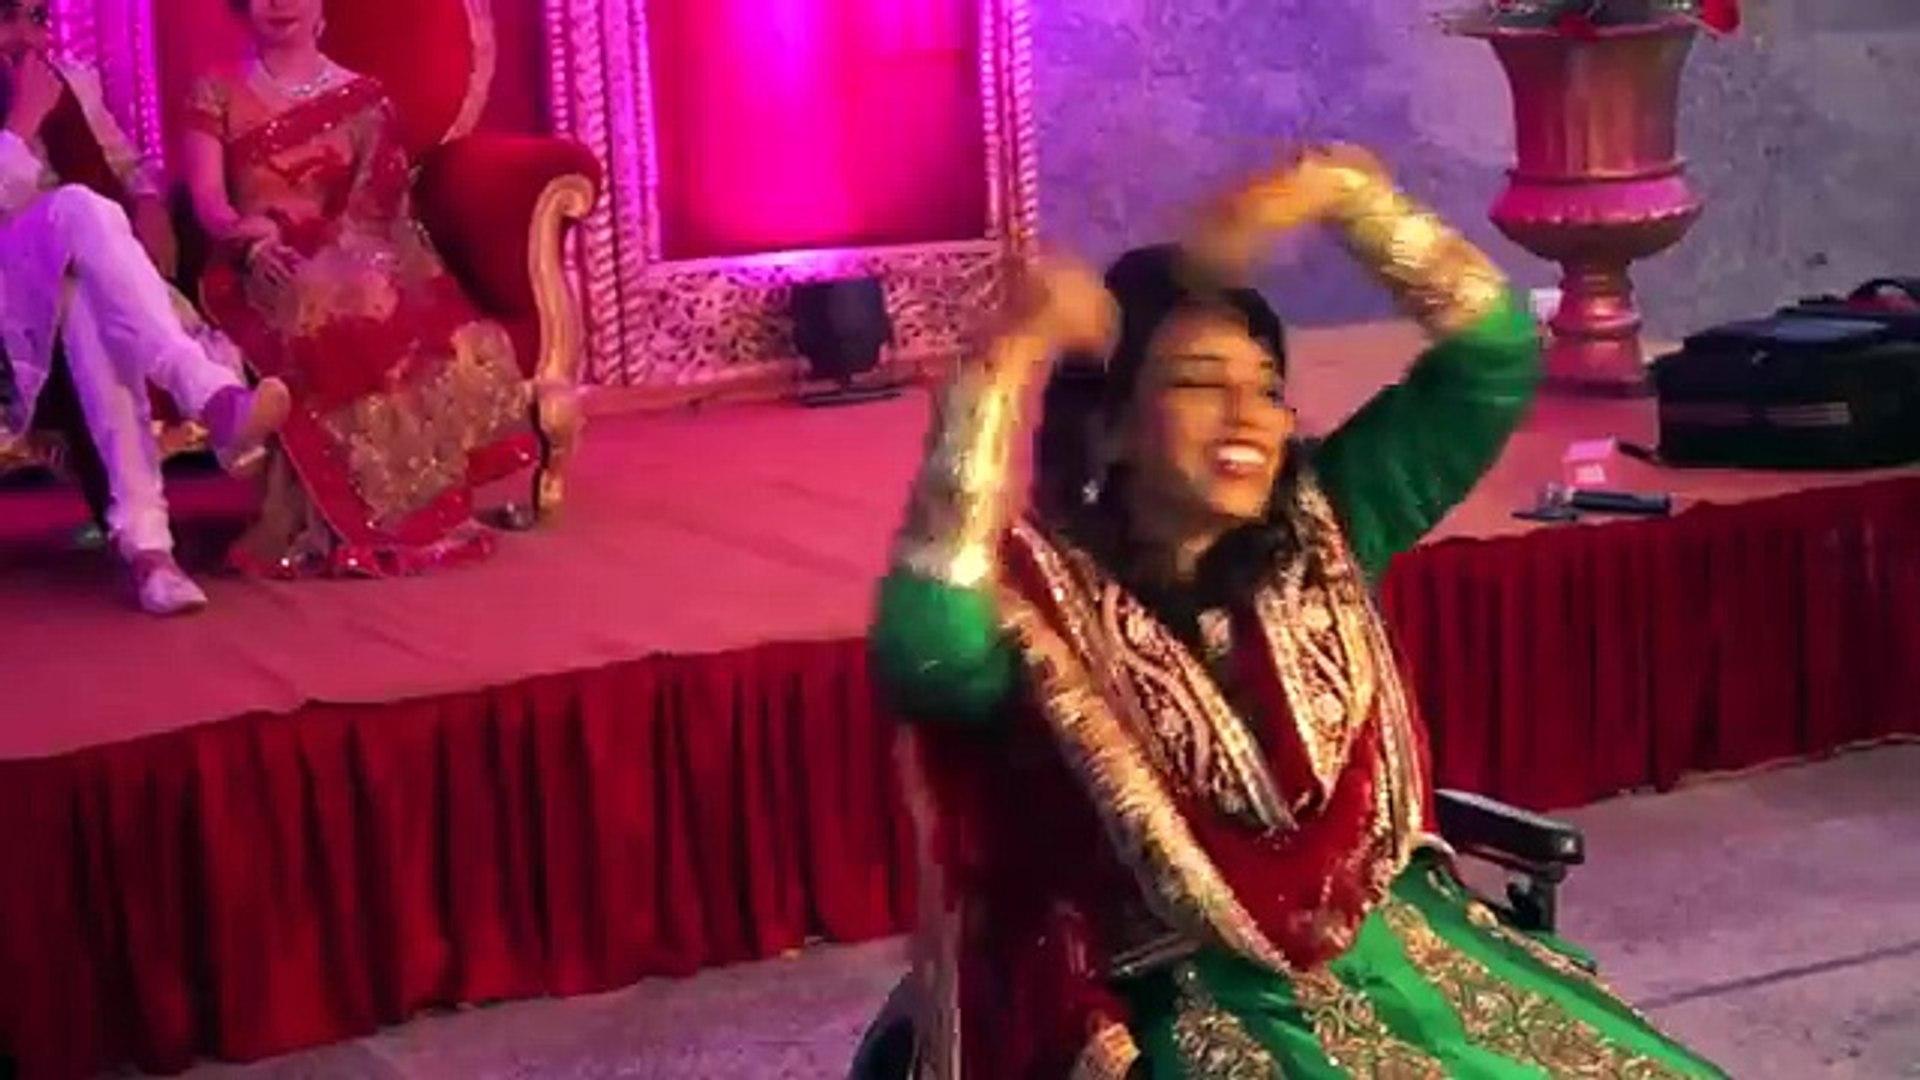 World Record Dance Performance - Chittiyaan Kalaiyaan Best Bollywood Wedding Dance 2016